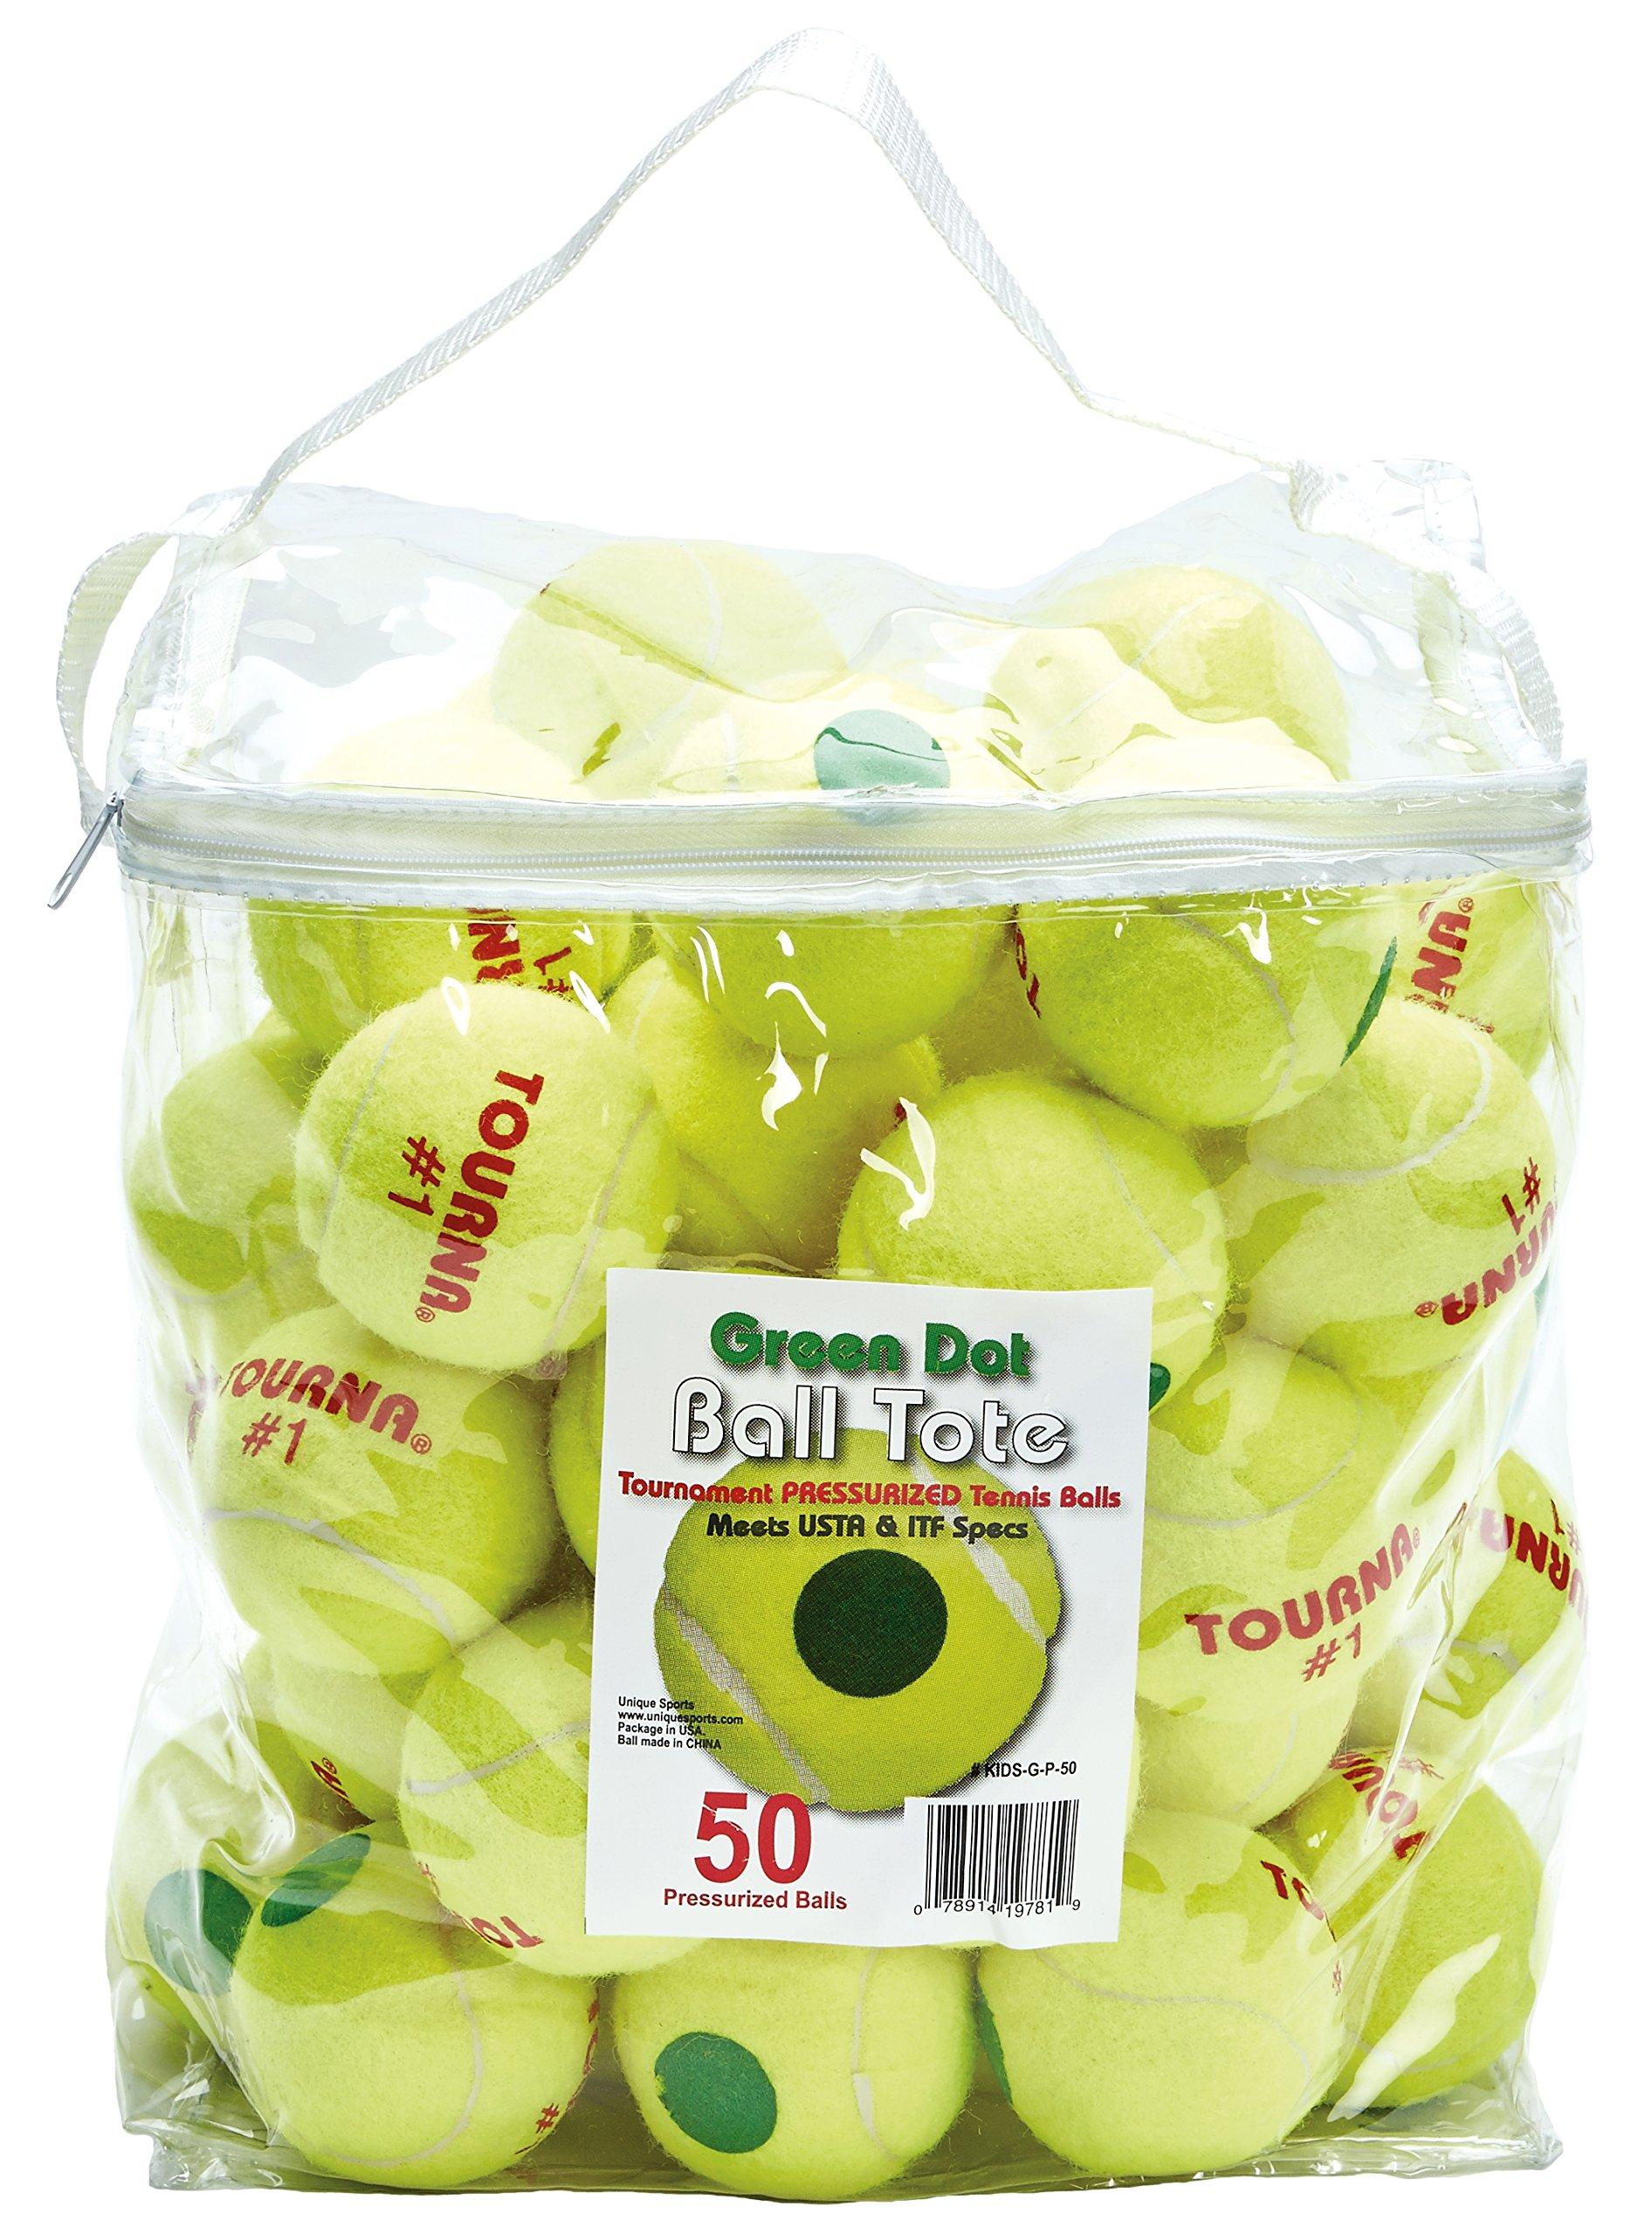 TOURNA Pressurized Green Dot Tennis Balls 50 Ball Tote Bag Green Dot Tennis Balls Pressurized